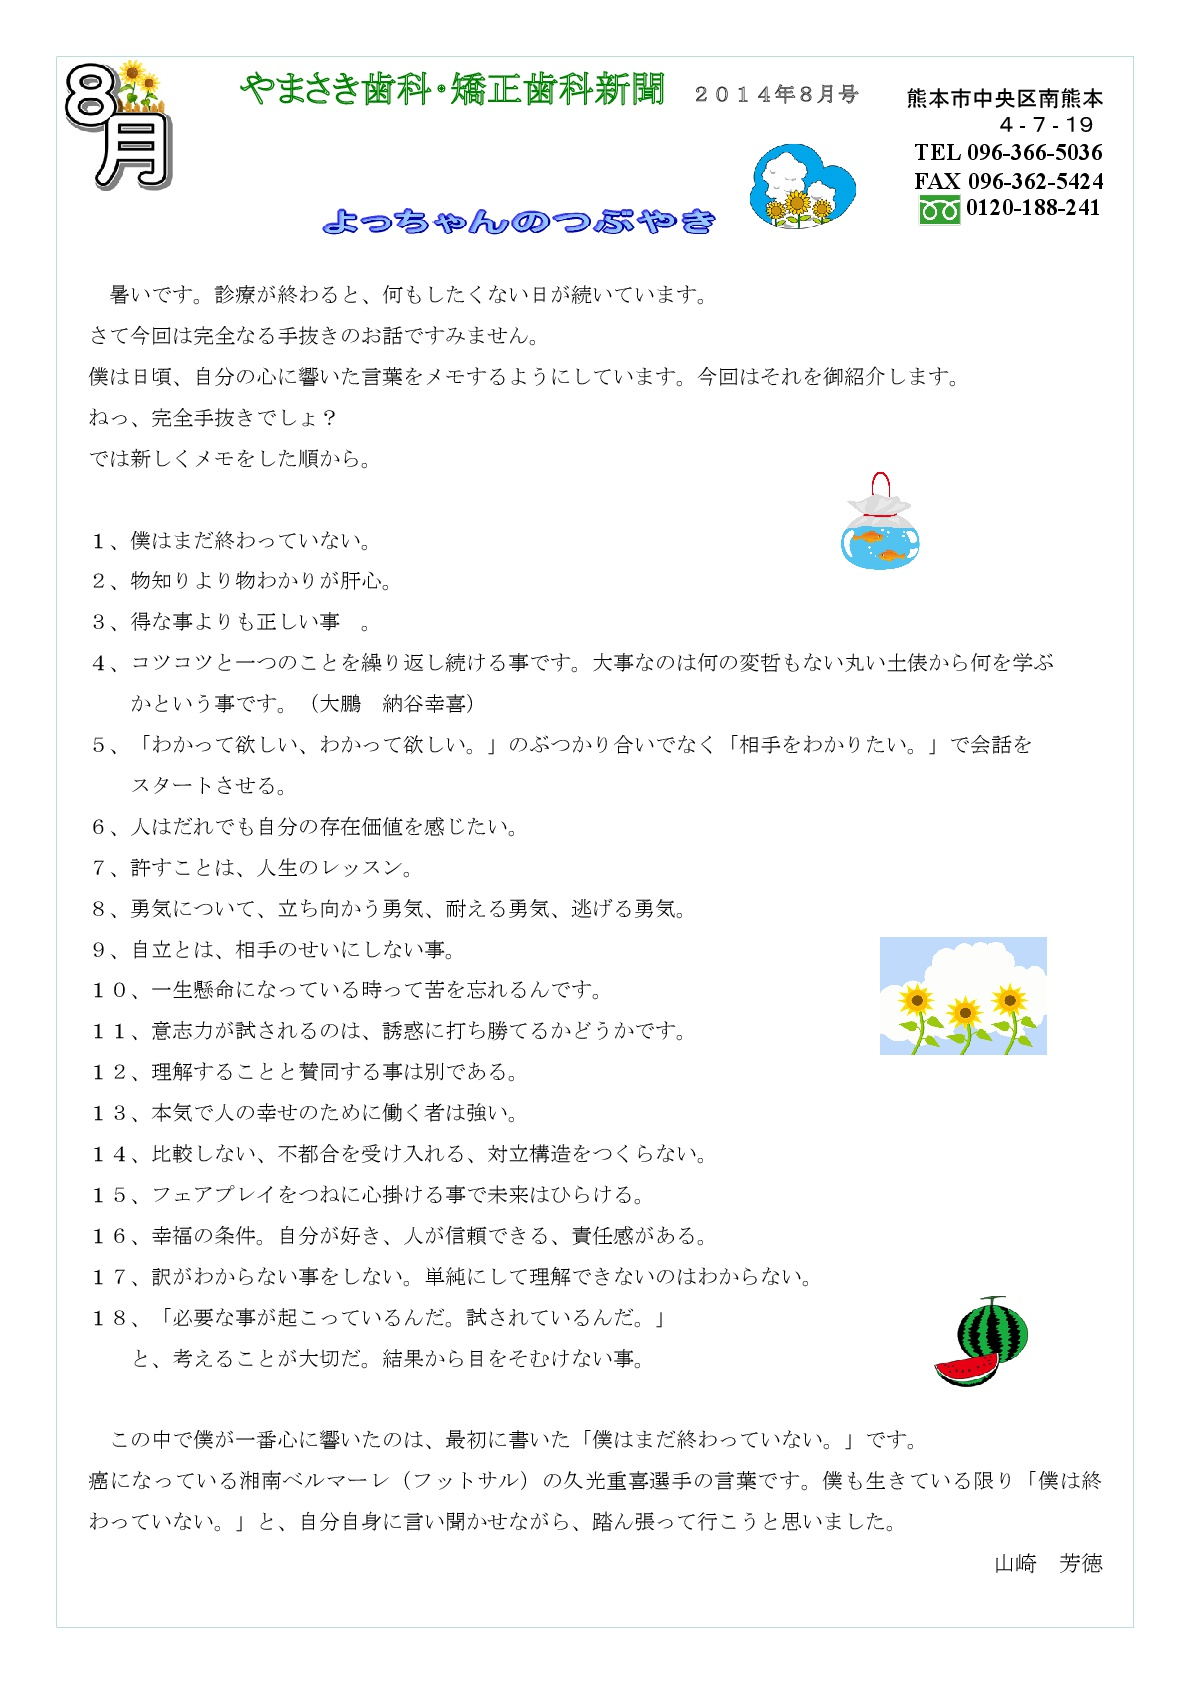 sinbun14-8-1-001